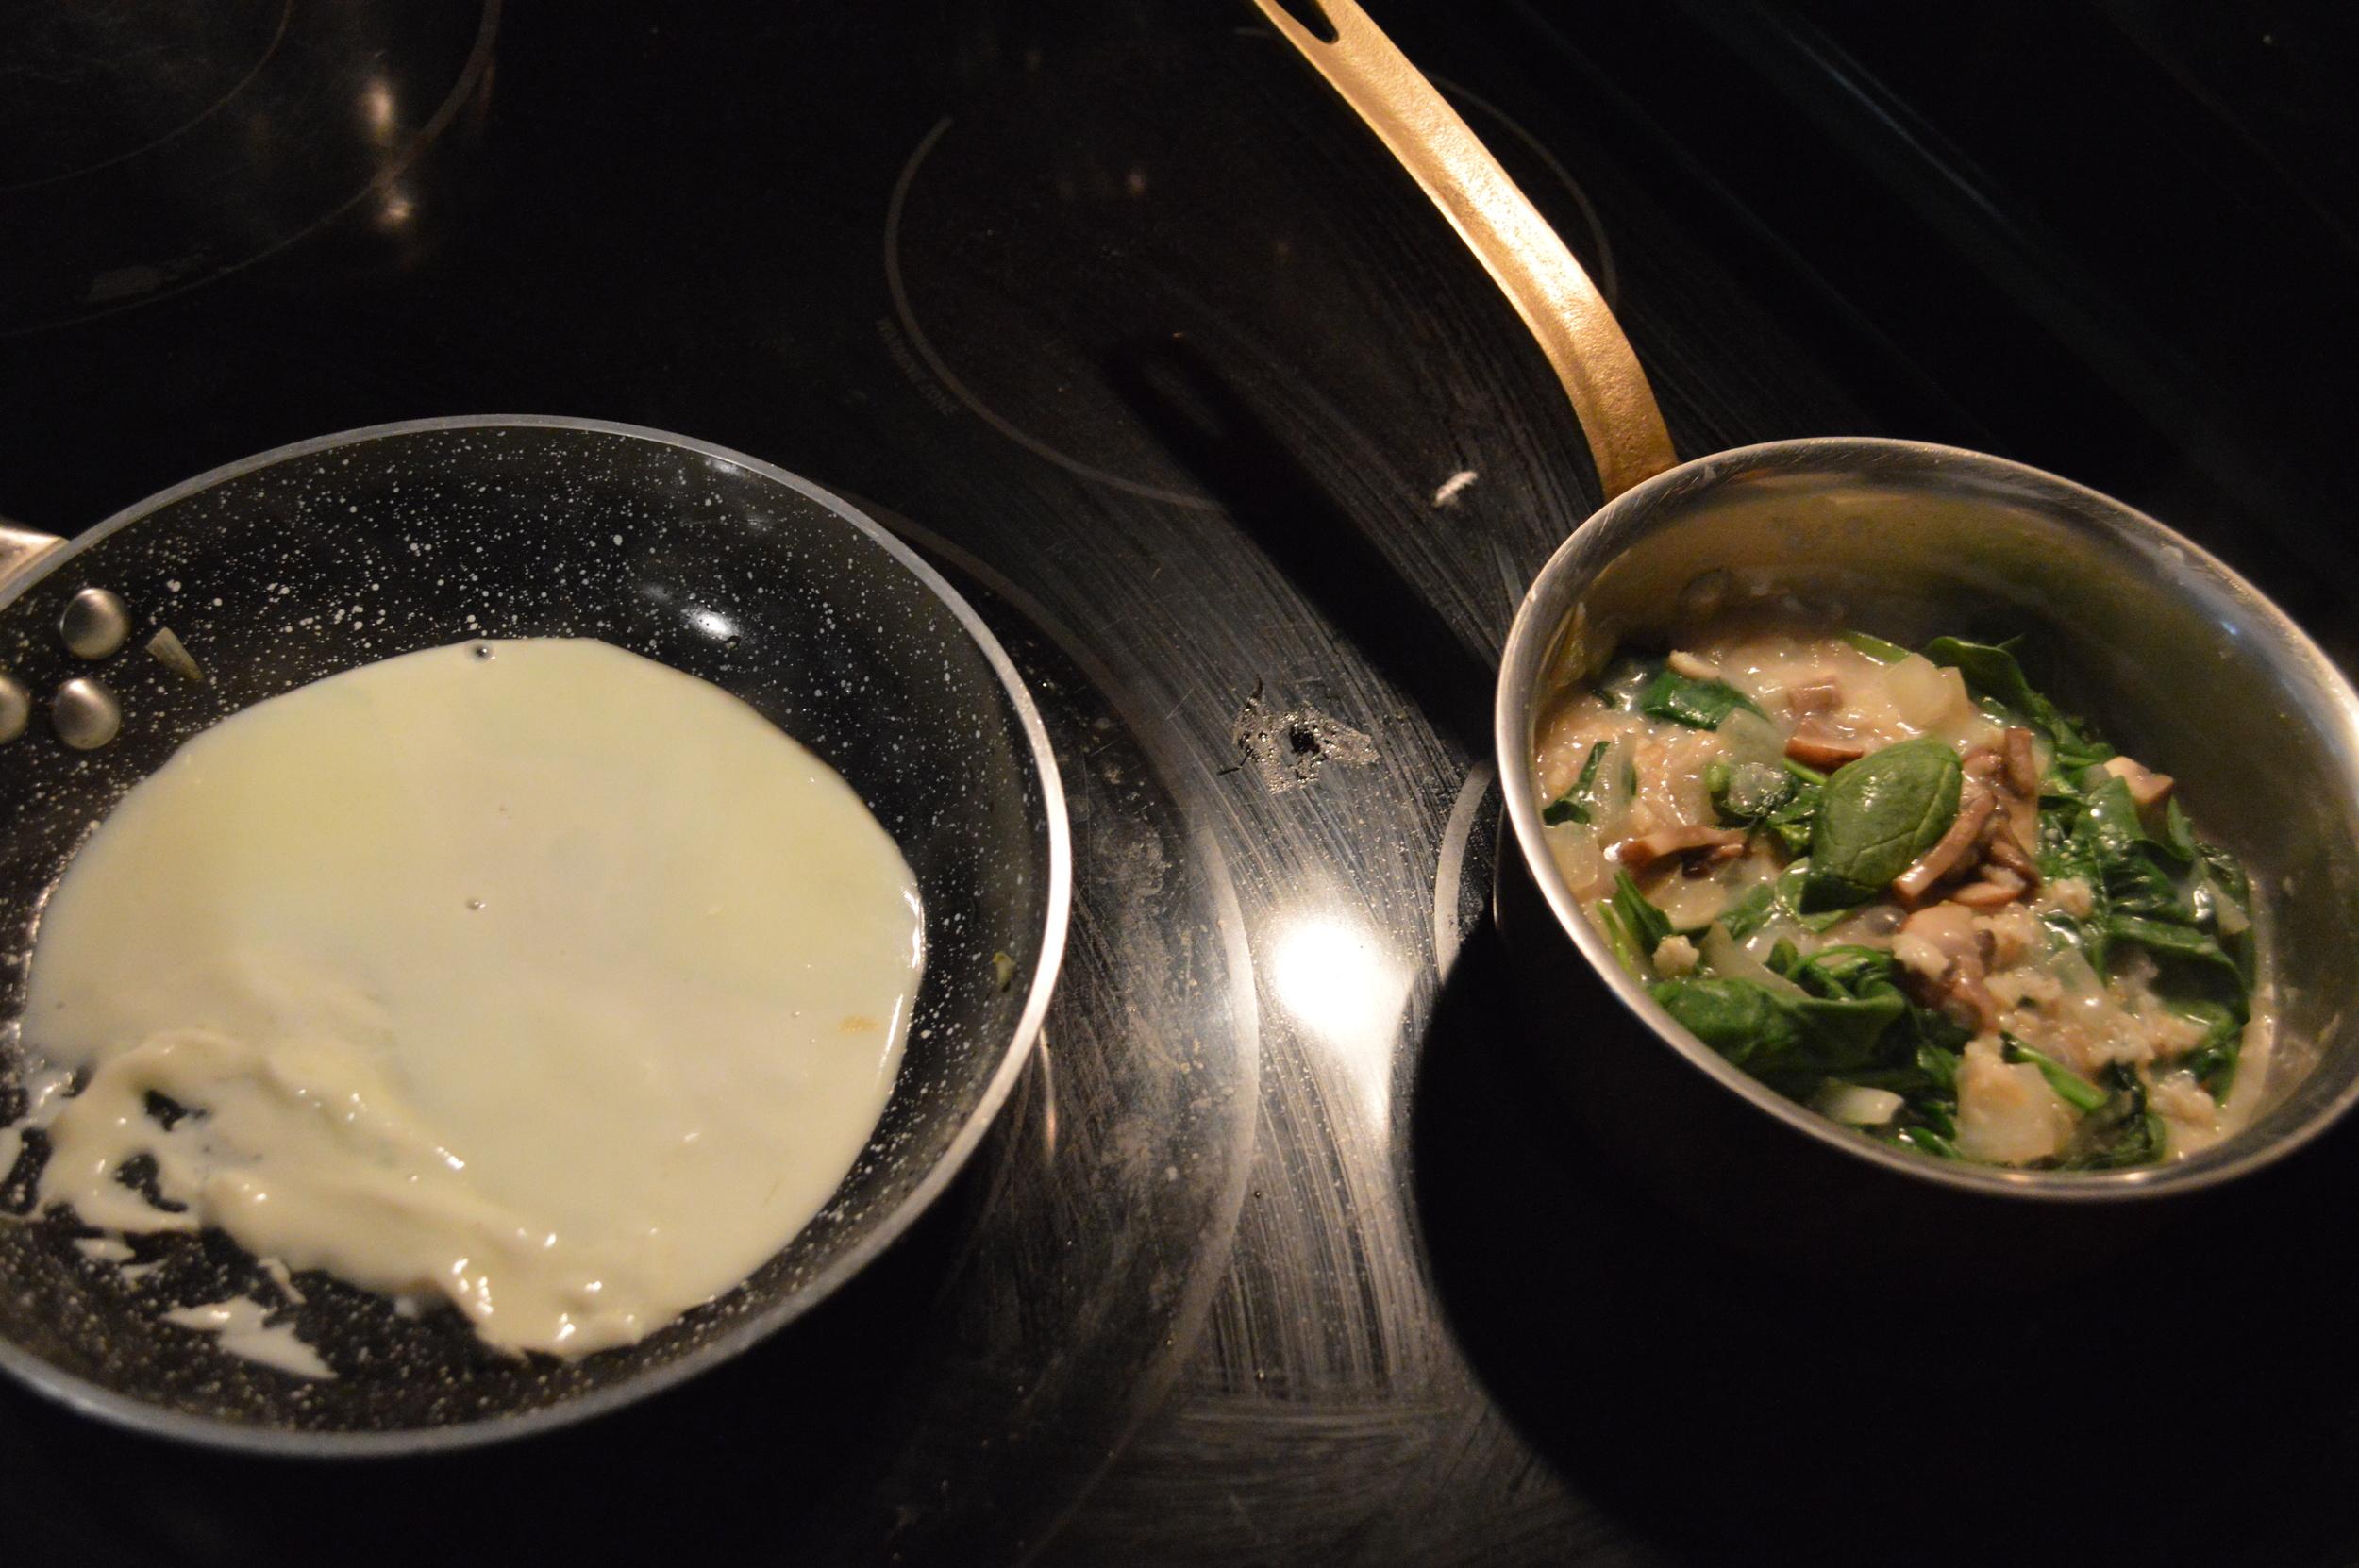 Egg Whites - Savory Oatmeal Ingredients